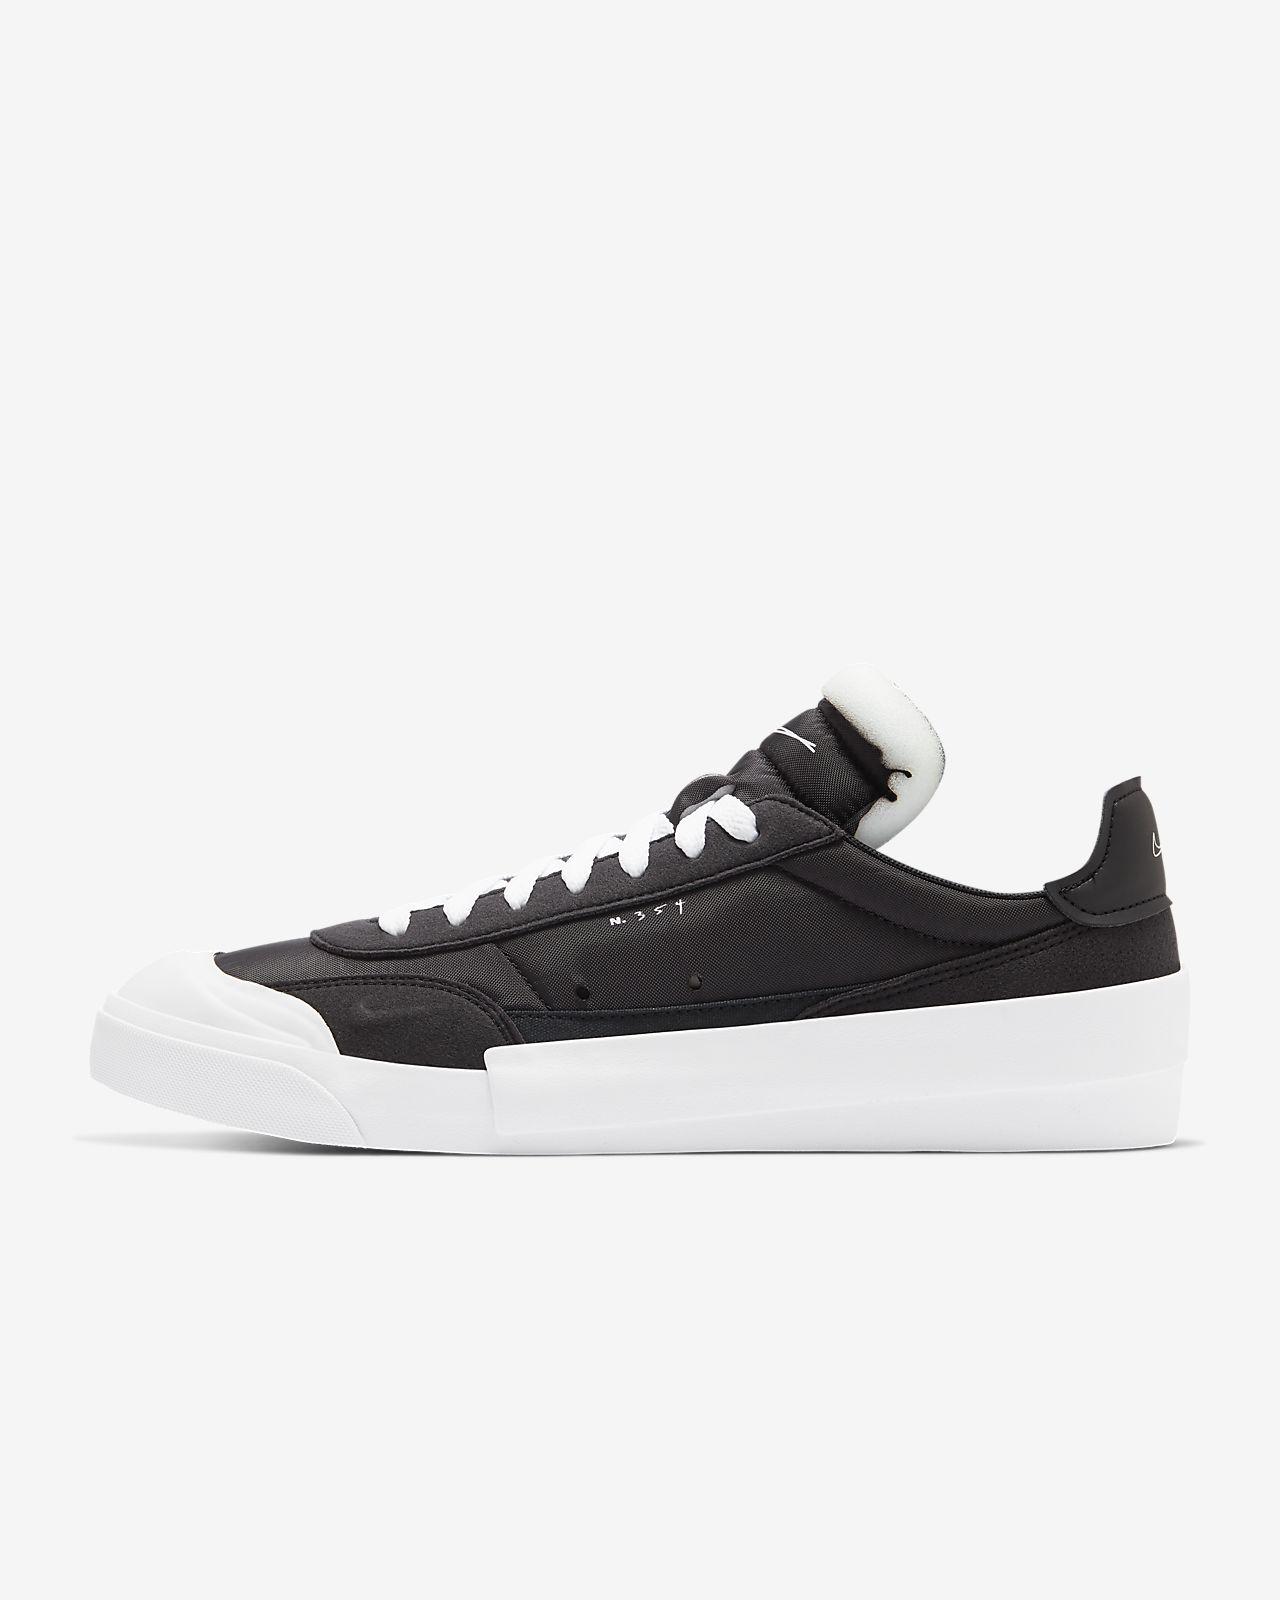 Nike Drop Type LX Men's Shoe